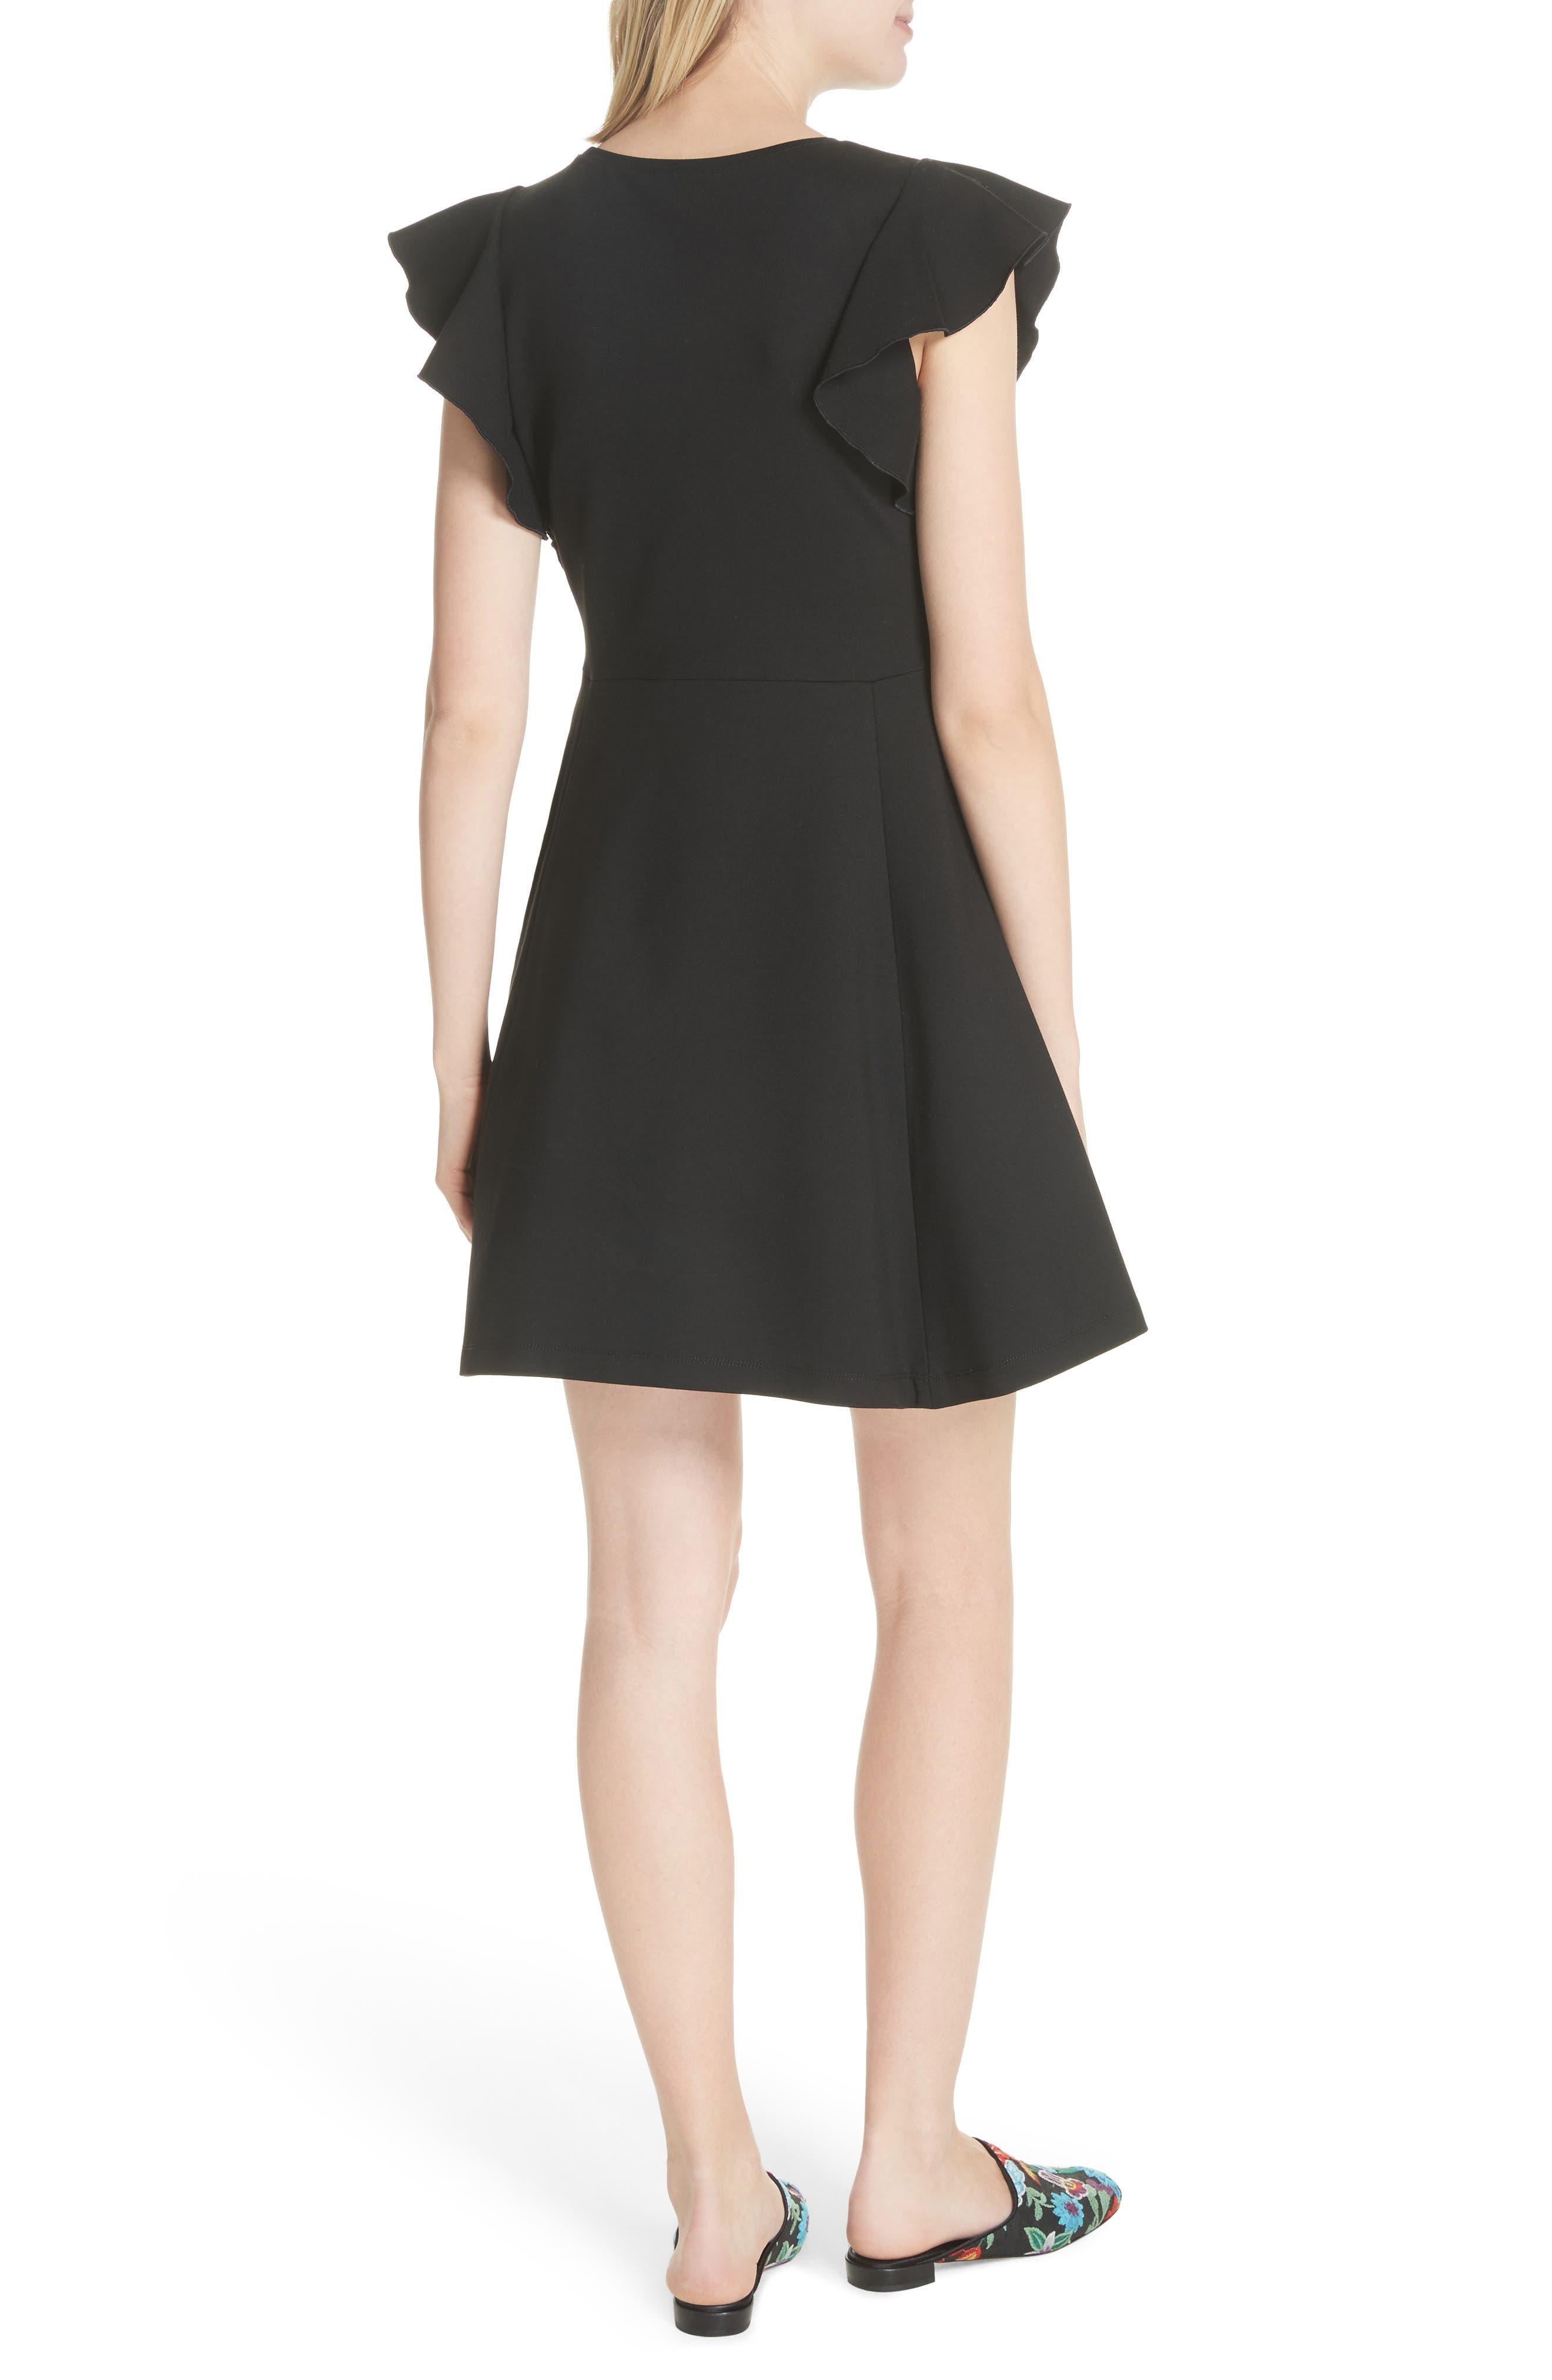 fluttter sleeve ponte knit dress,                             Alternate thumbnail 2, color,                             Black